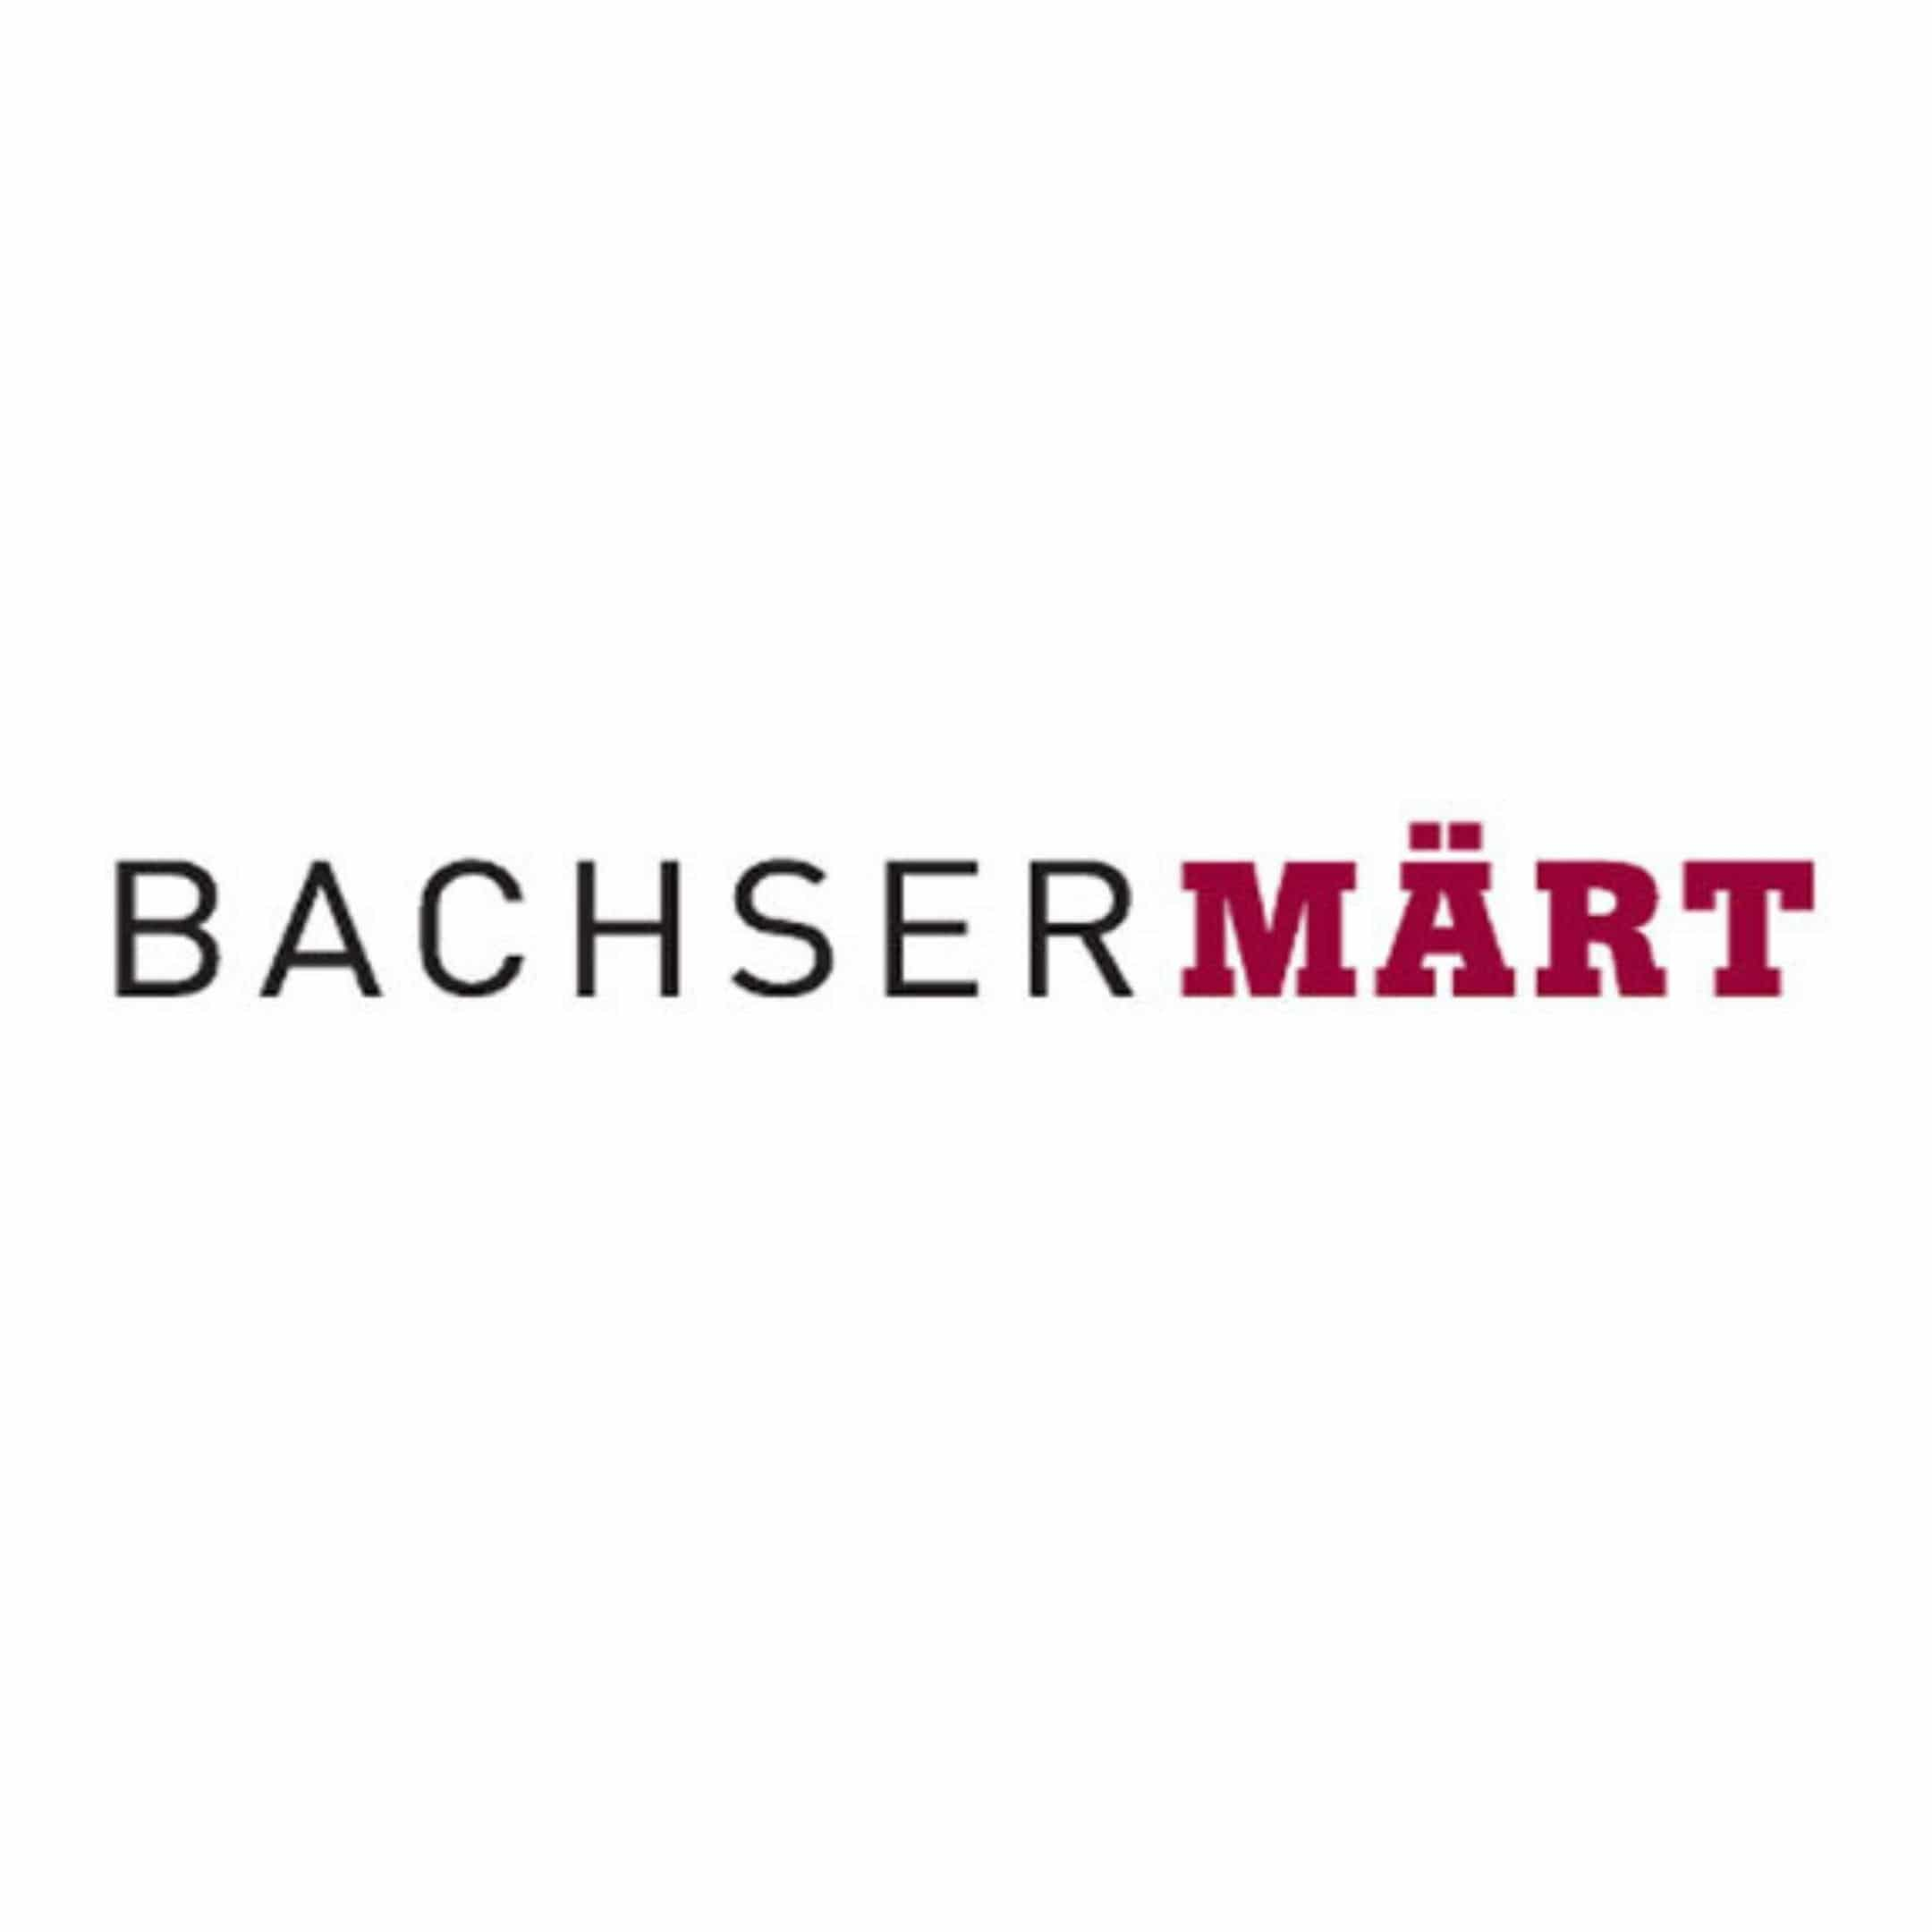 BachserMärt Bachs